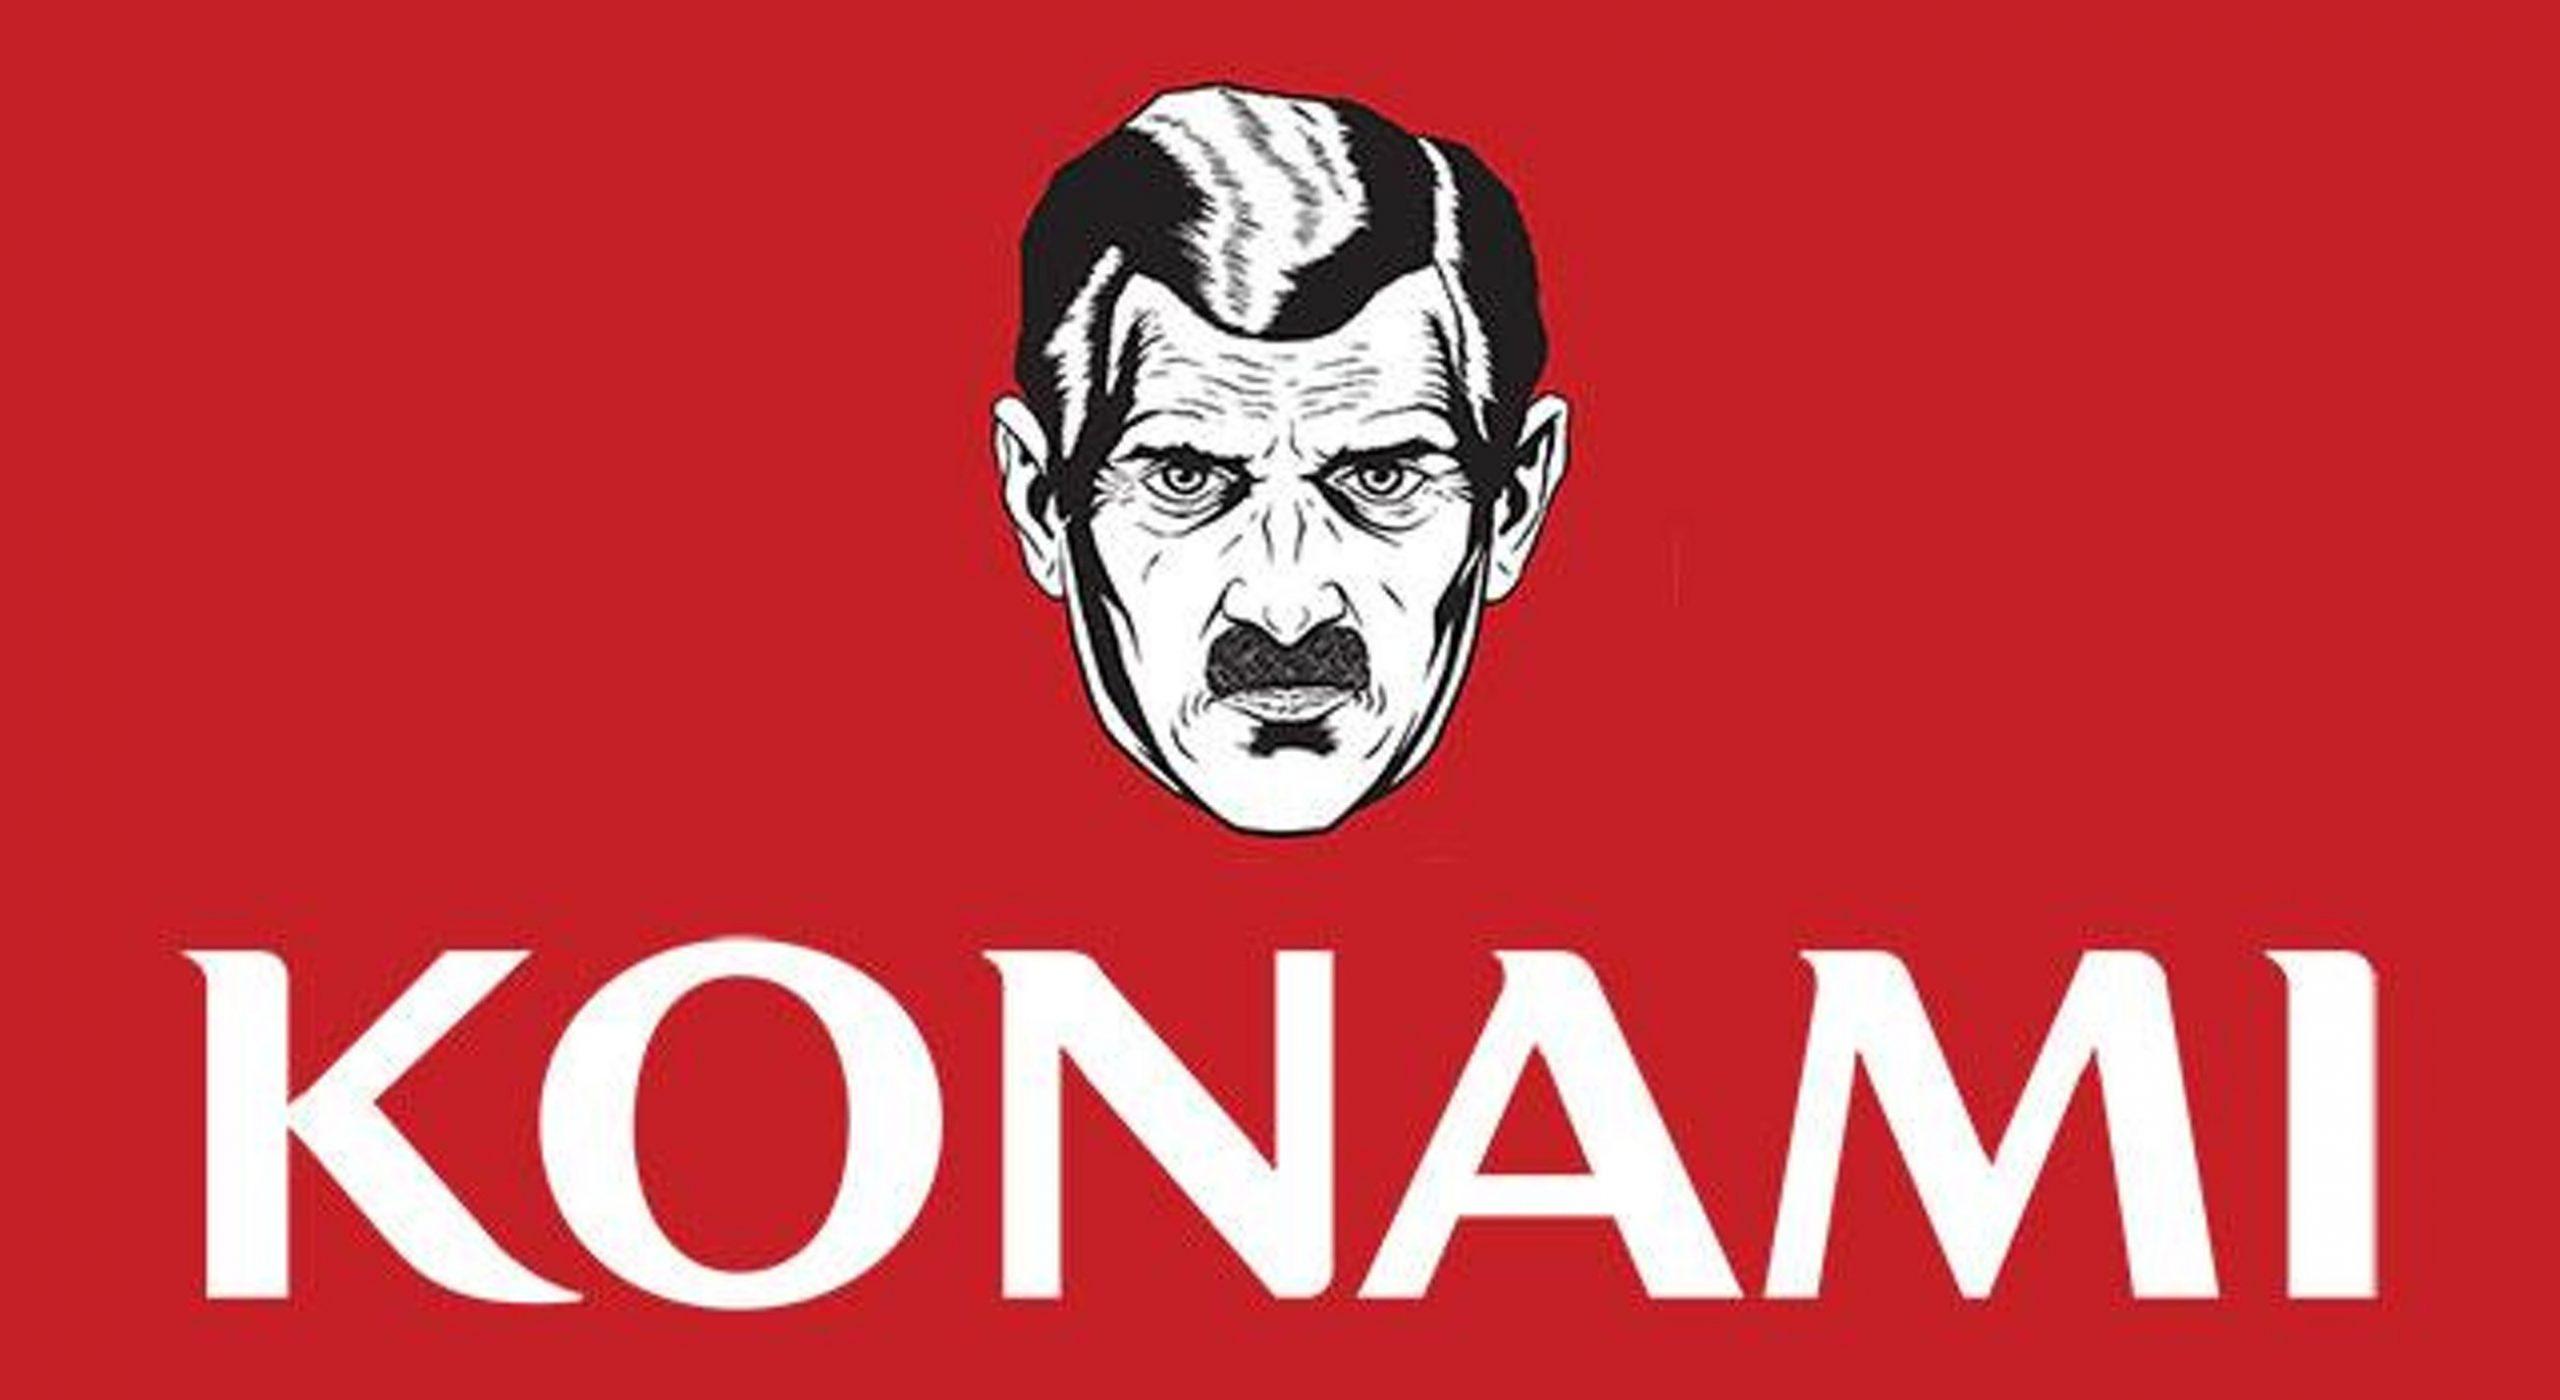 Konami картинка